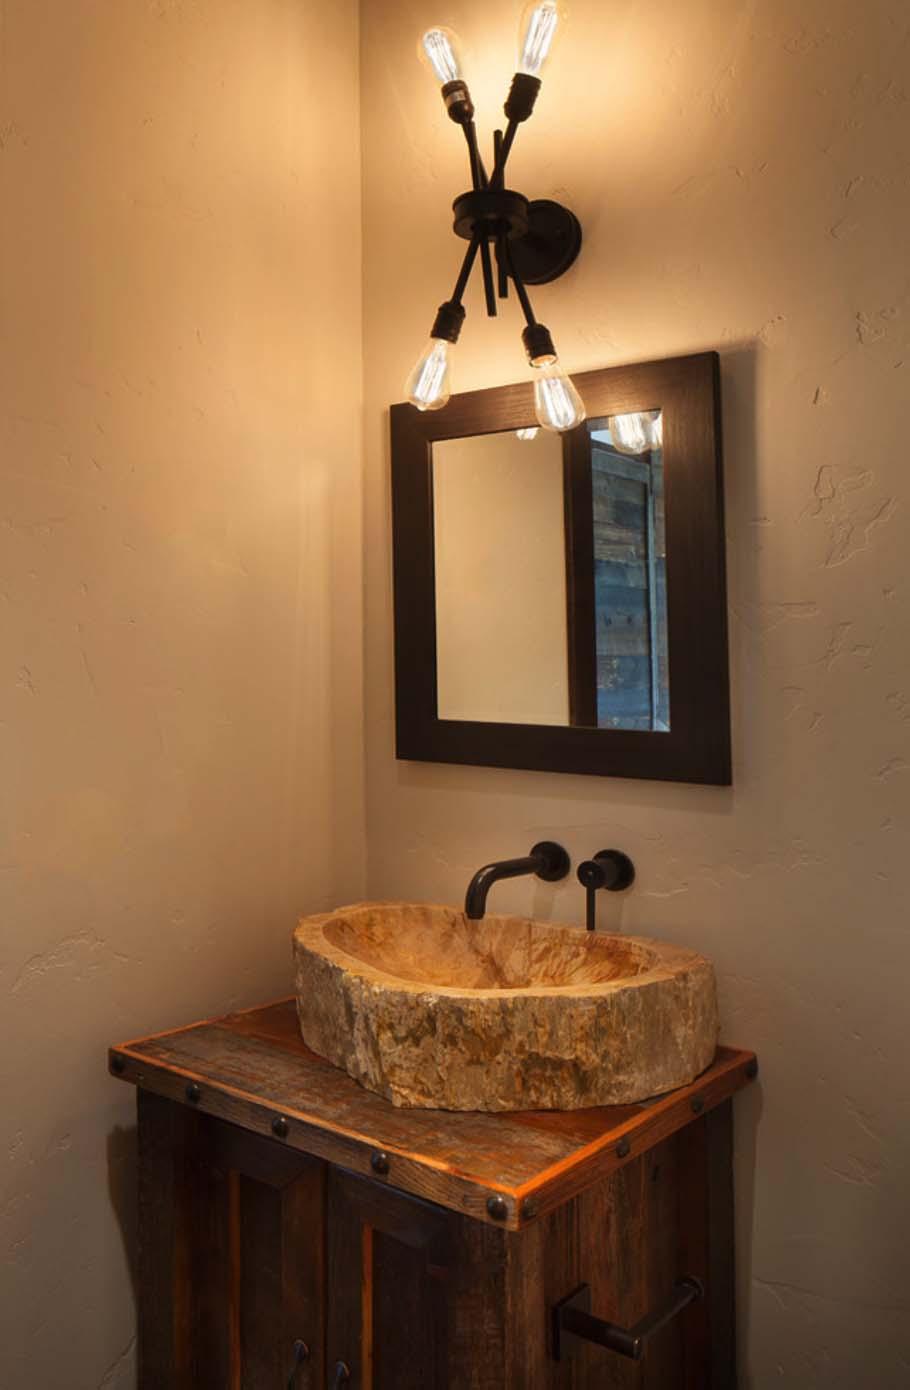 Rustic-Modern Dwelling-Sage Interior Design-12-1 Kindesign